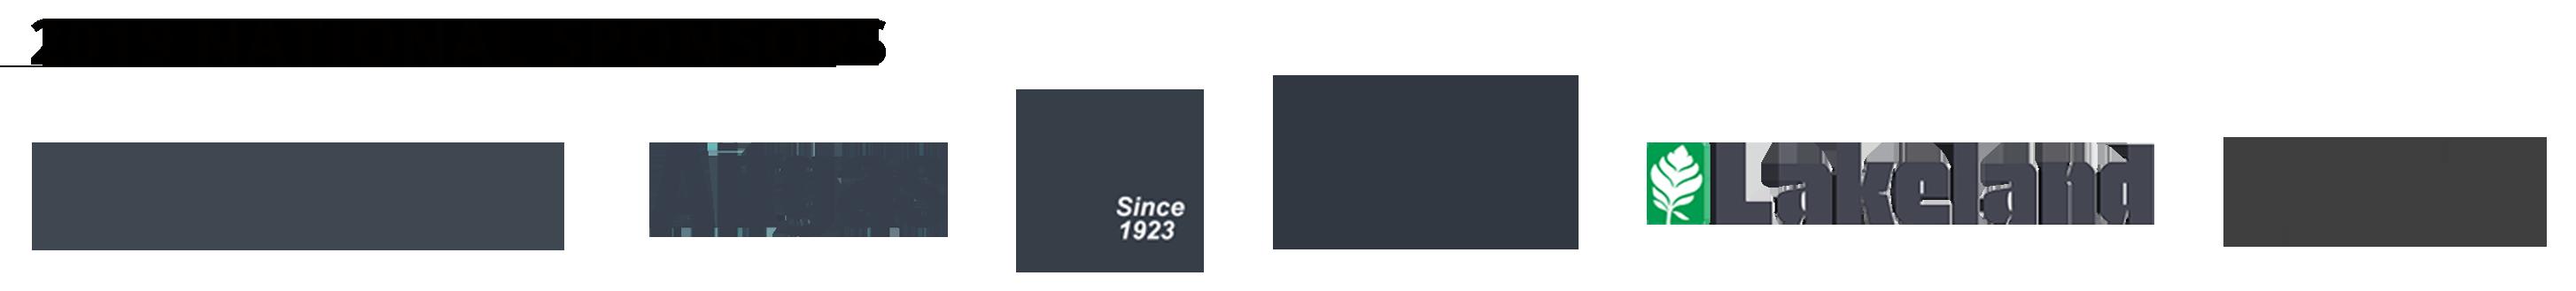 ASTI NS Sponsors Logos